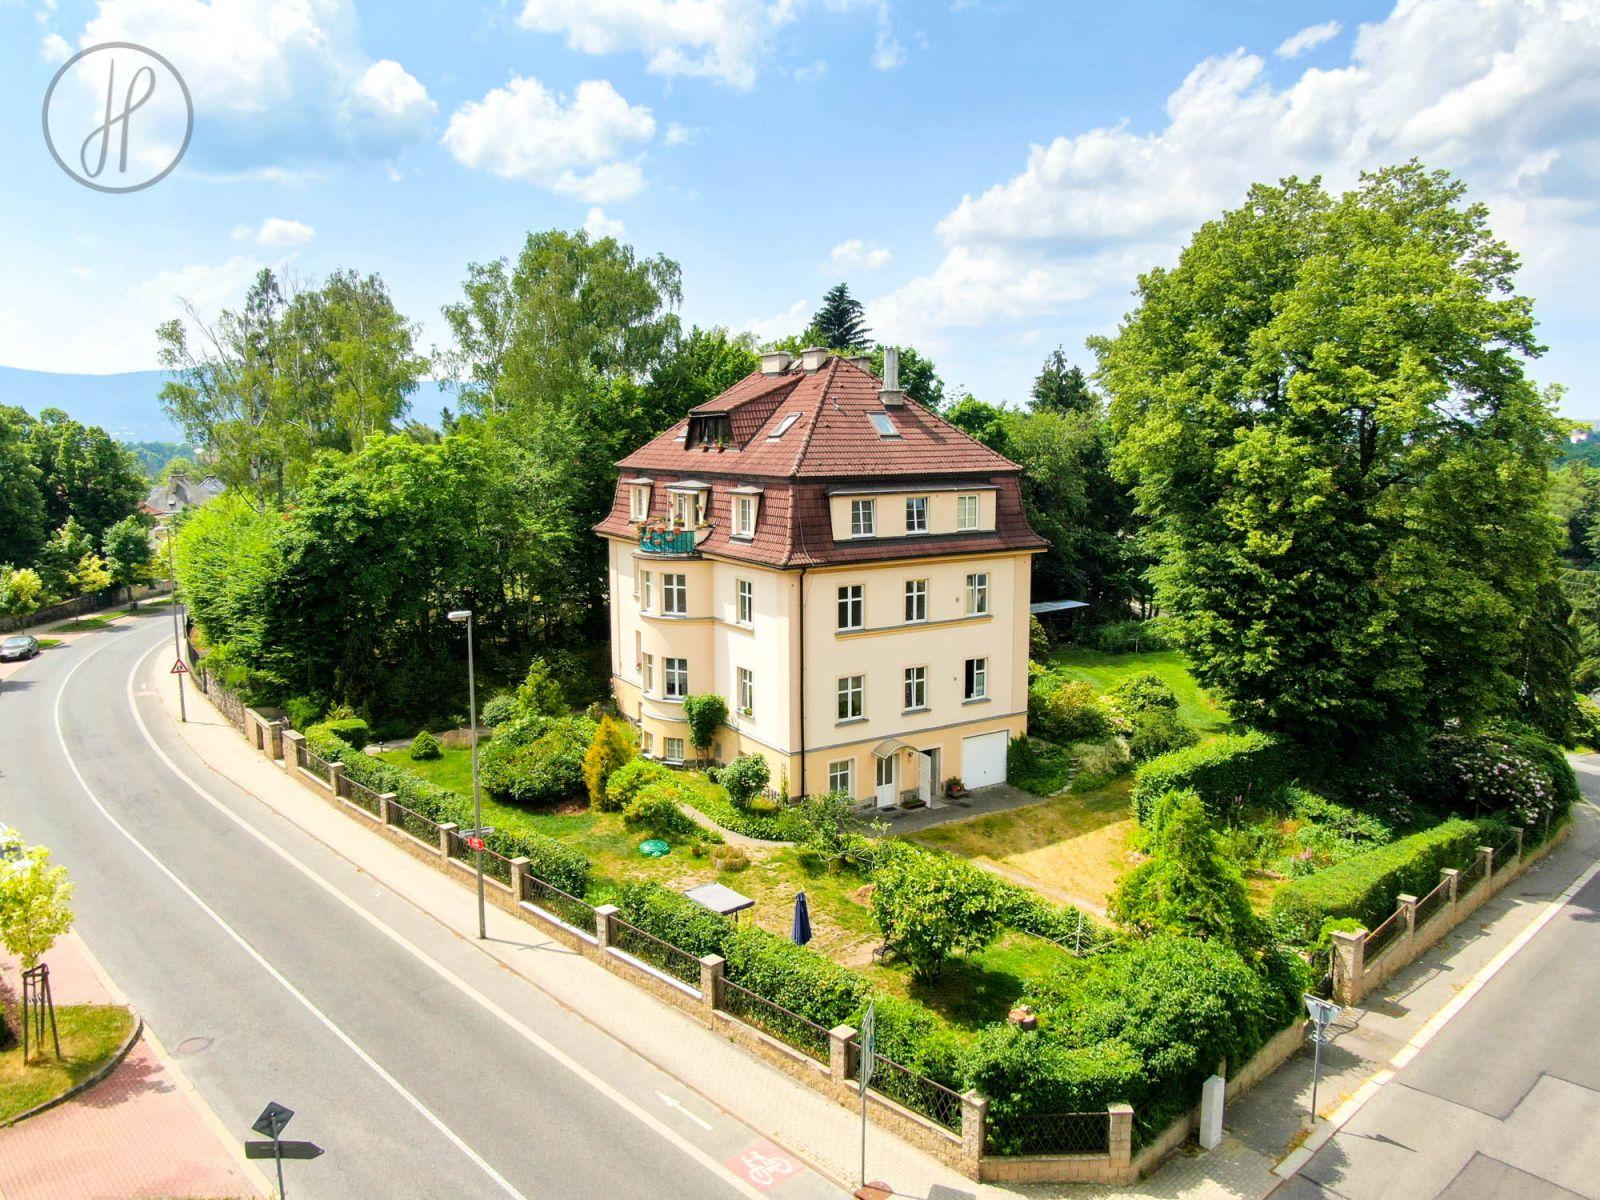 Pronájem bytu 1+kk, 22 m2, Liberec I-Staré Město